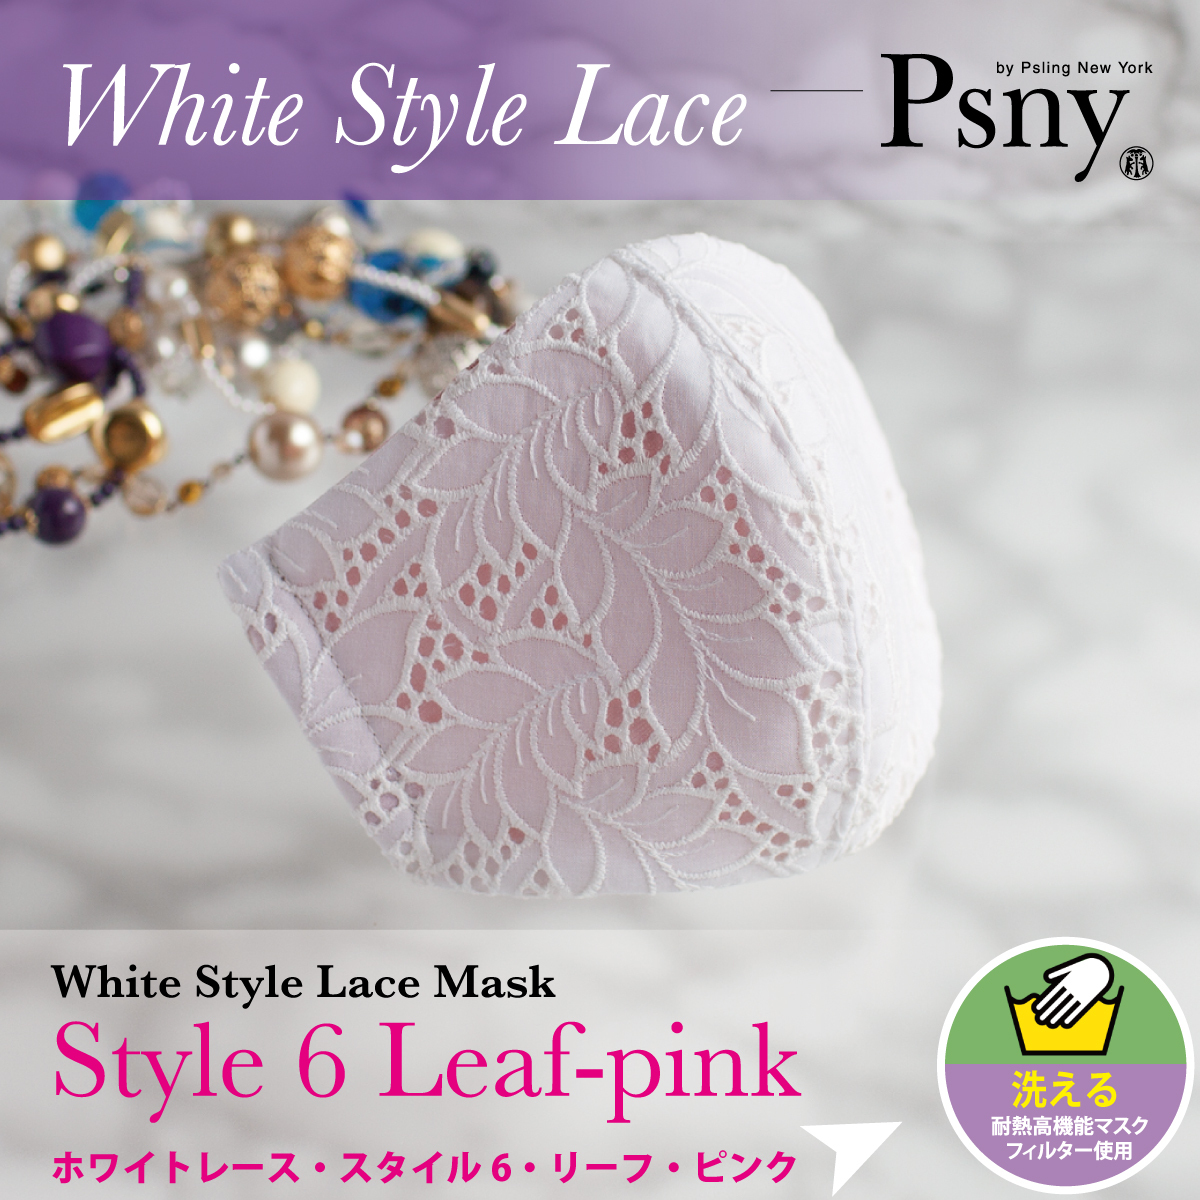 PSNY レース ホワイト スタイル リーフ ピンク 花粉 不織布フィルター入り 立体 大人用 美しい 高級 マスク 送料無料 L38